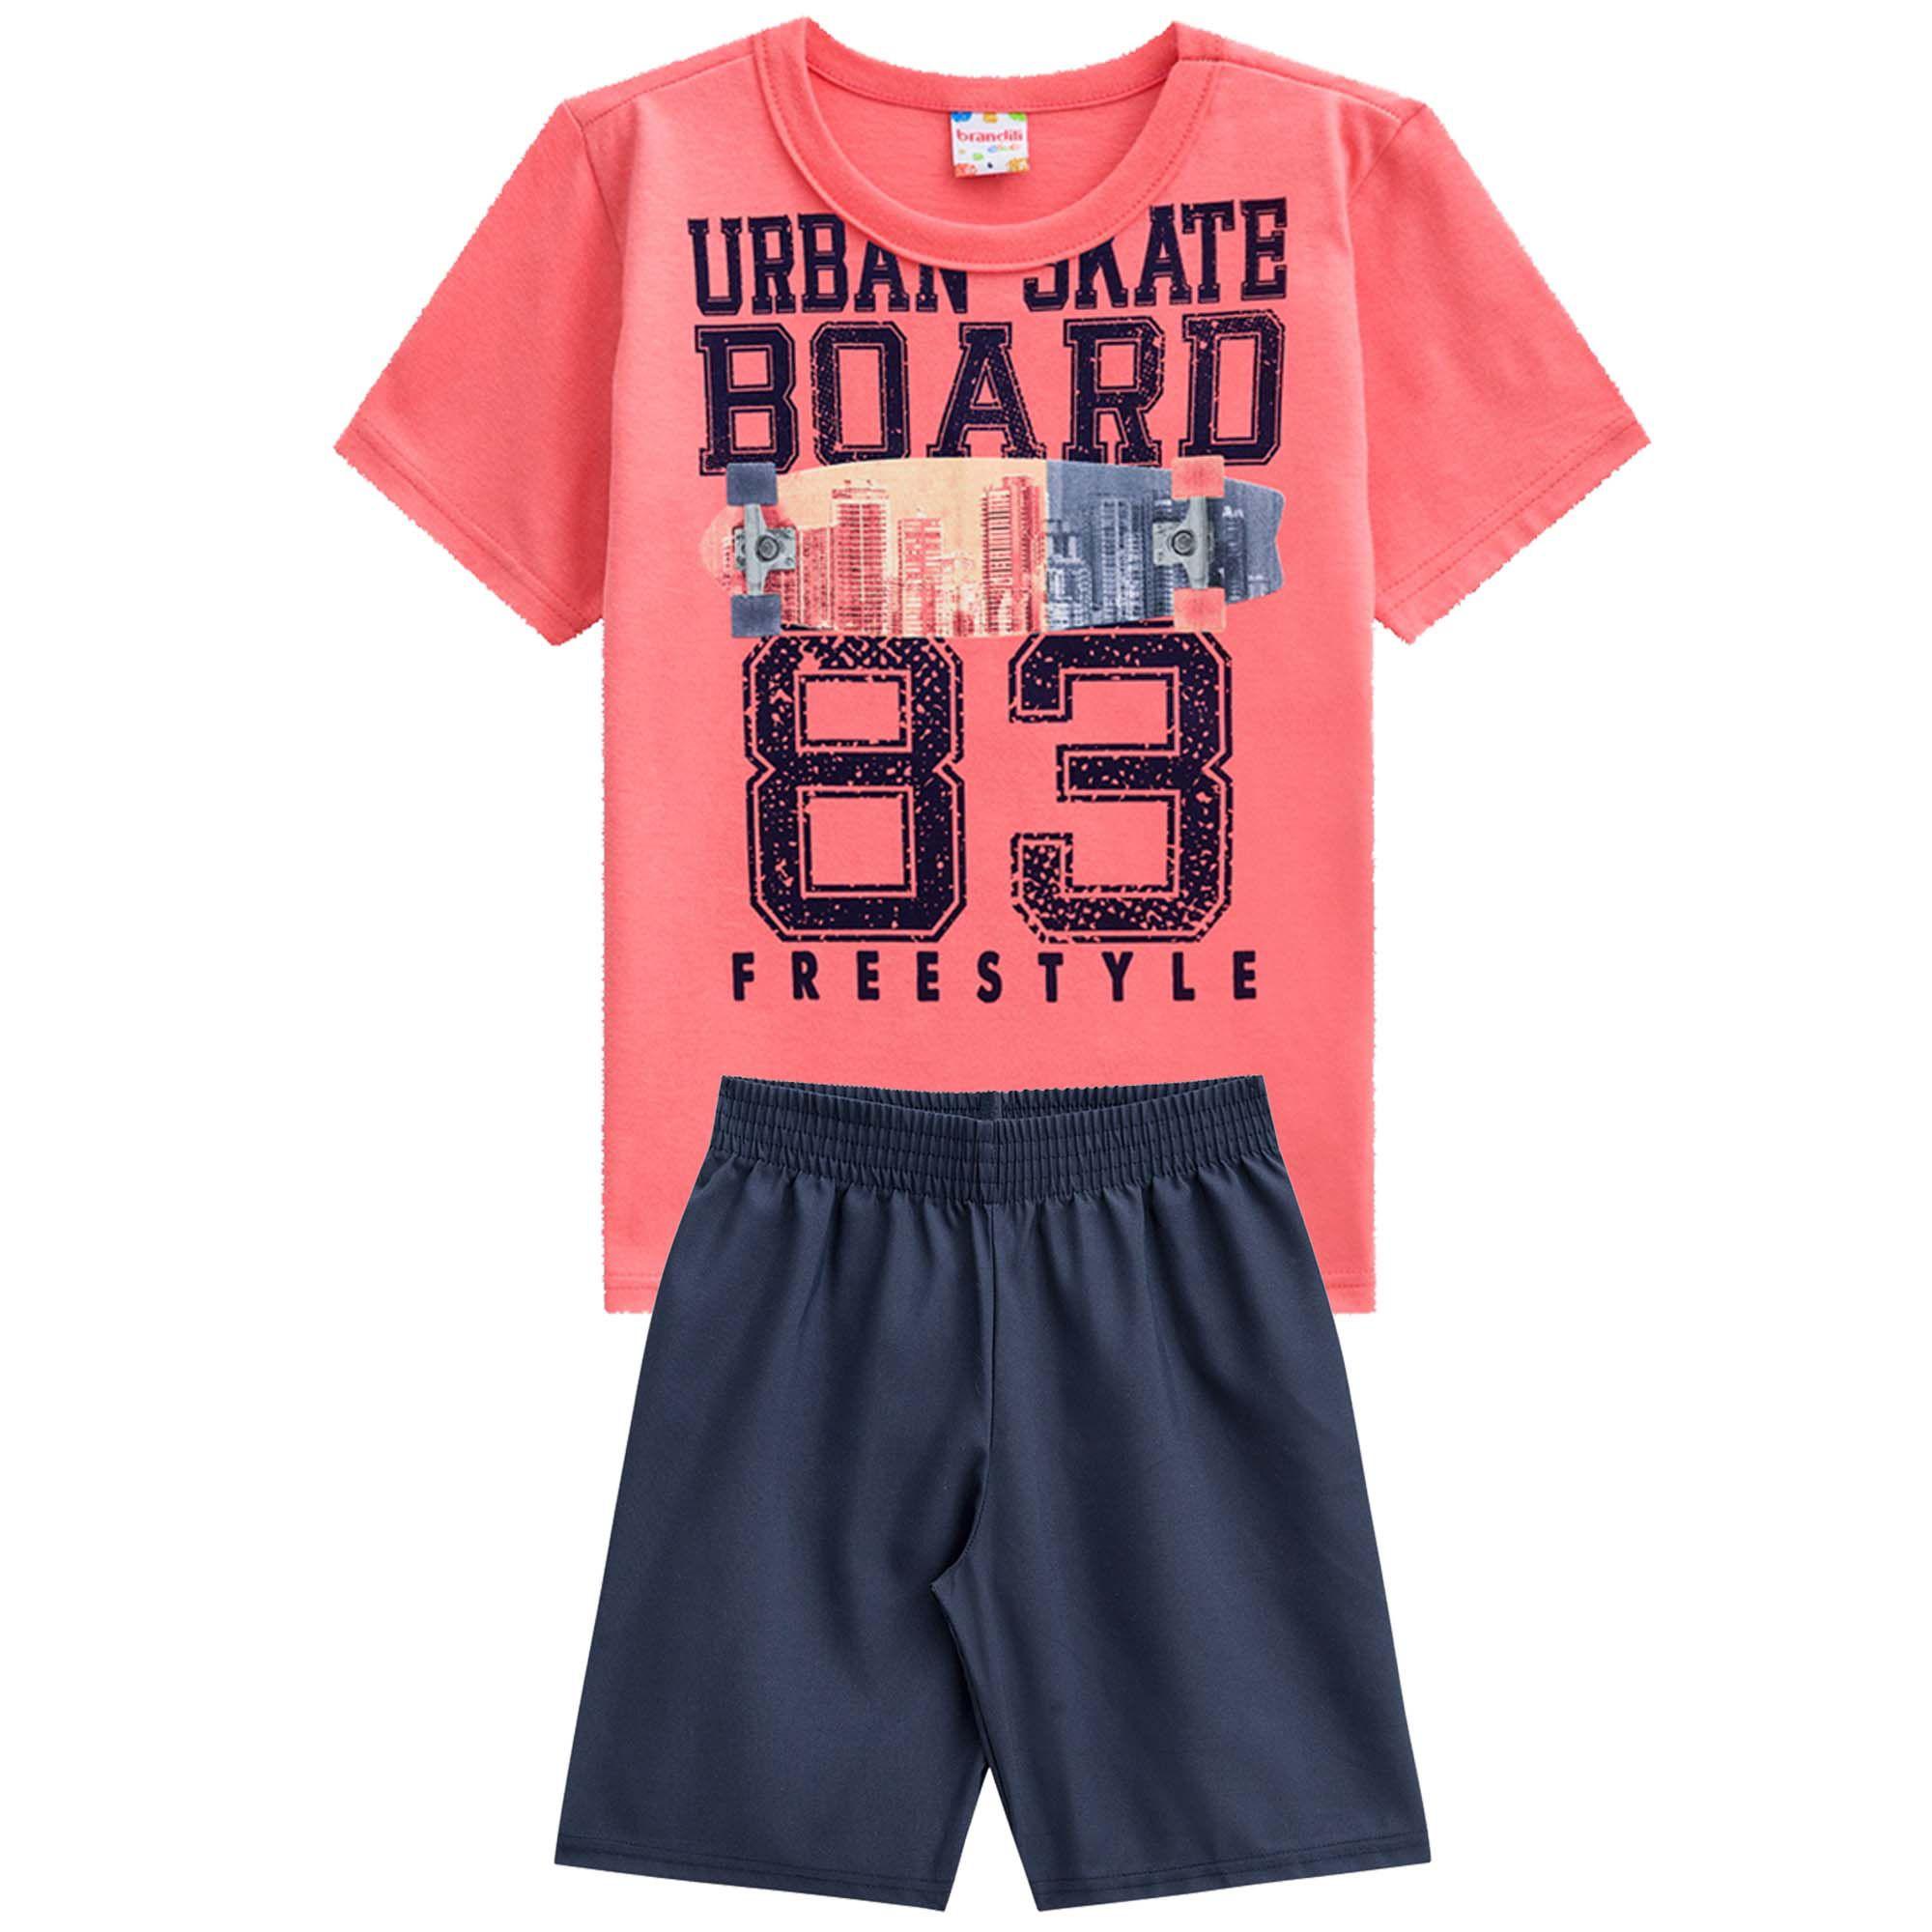 Conjunto Verão Brandili Club Camiseta Urban Skate Board Freestyle com Bermuda Moletinho - 4 ao 10